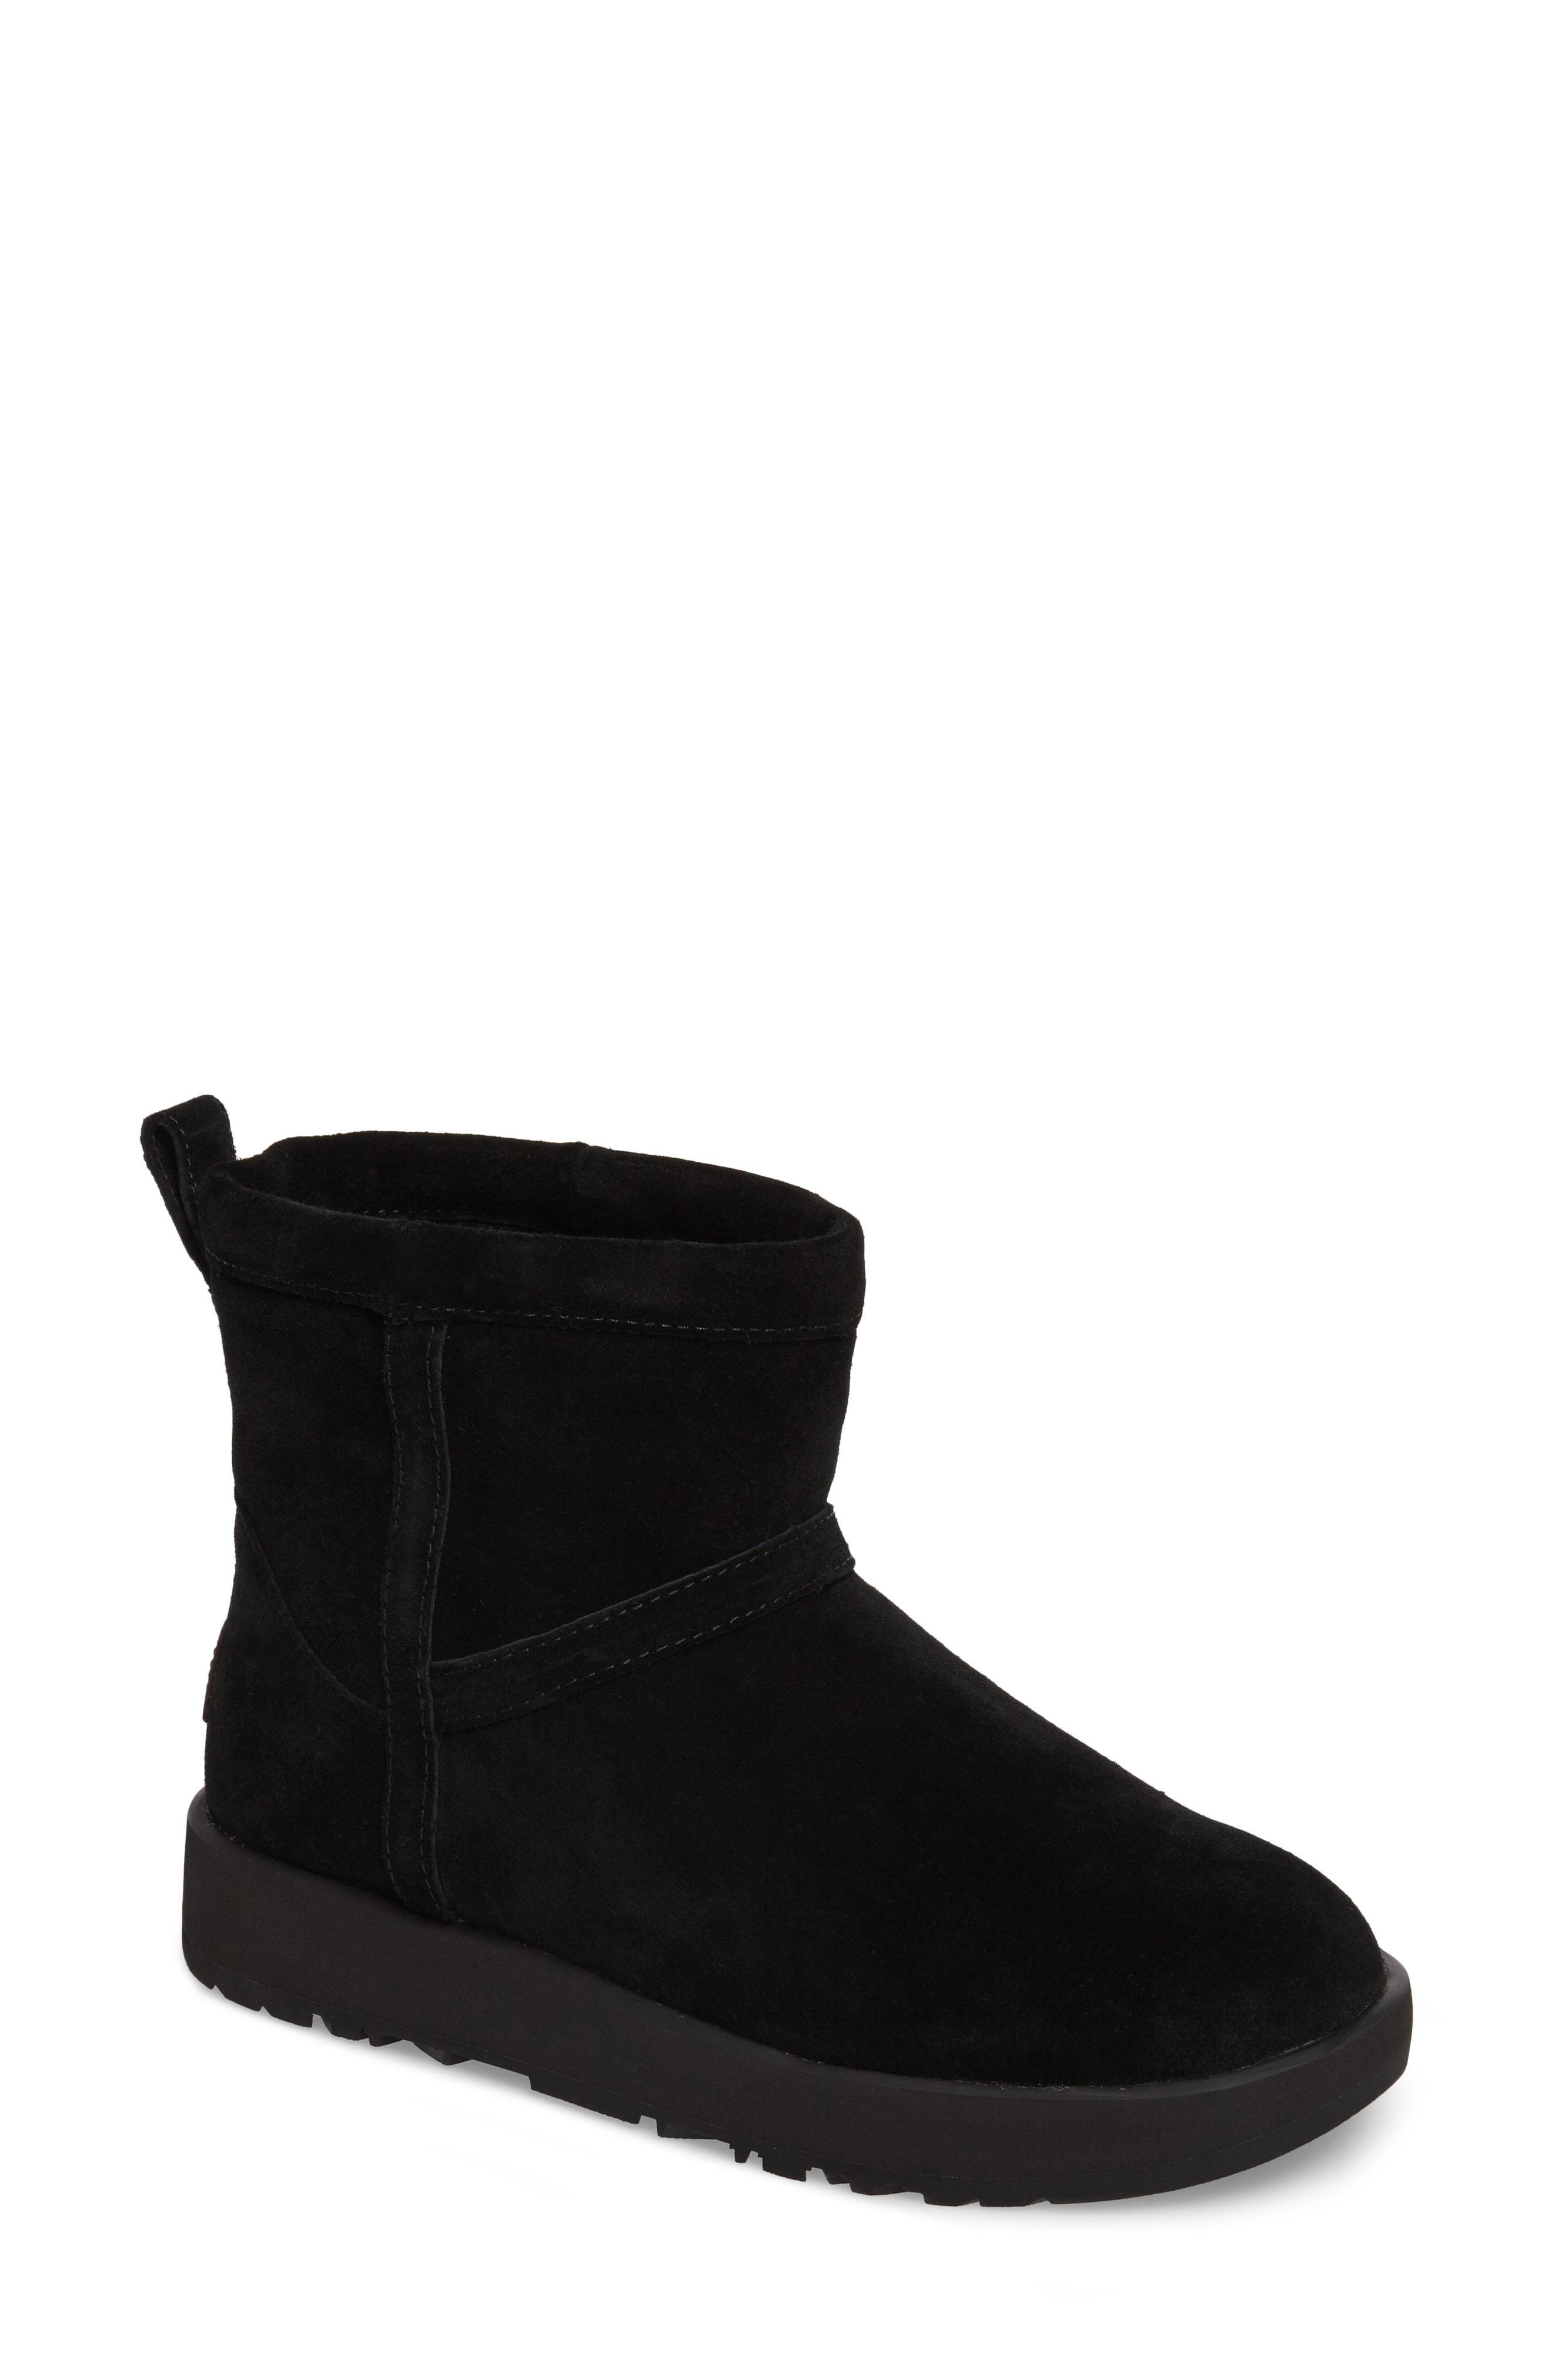 57ce66521f1 'Classic Mini Ii' Genuine Shearling Lined Boot (Women) in Black